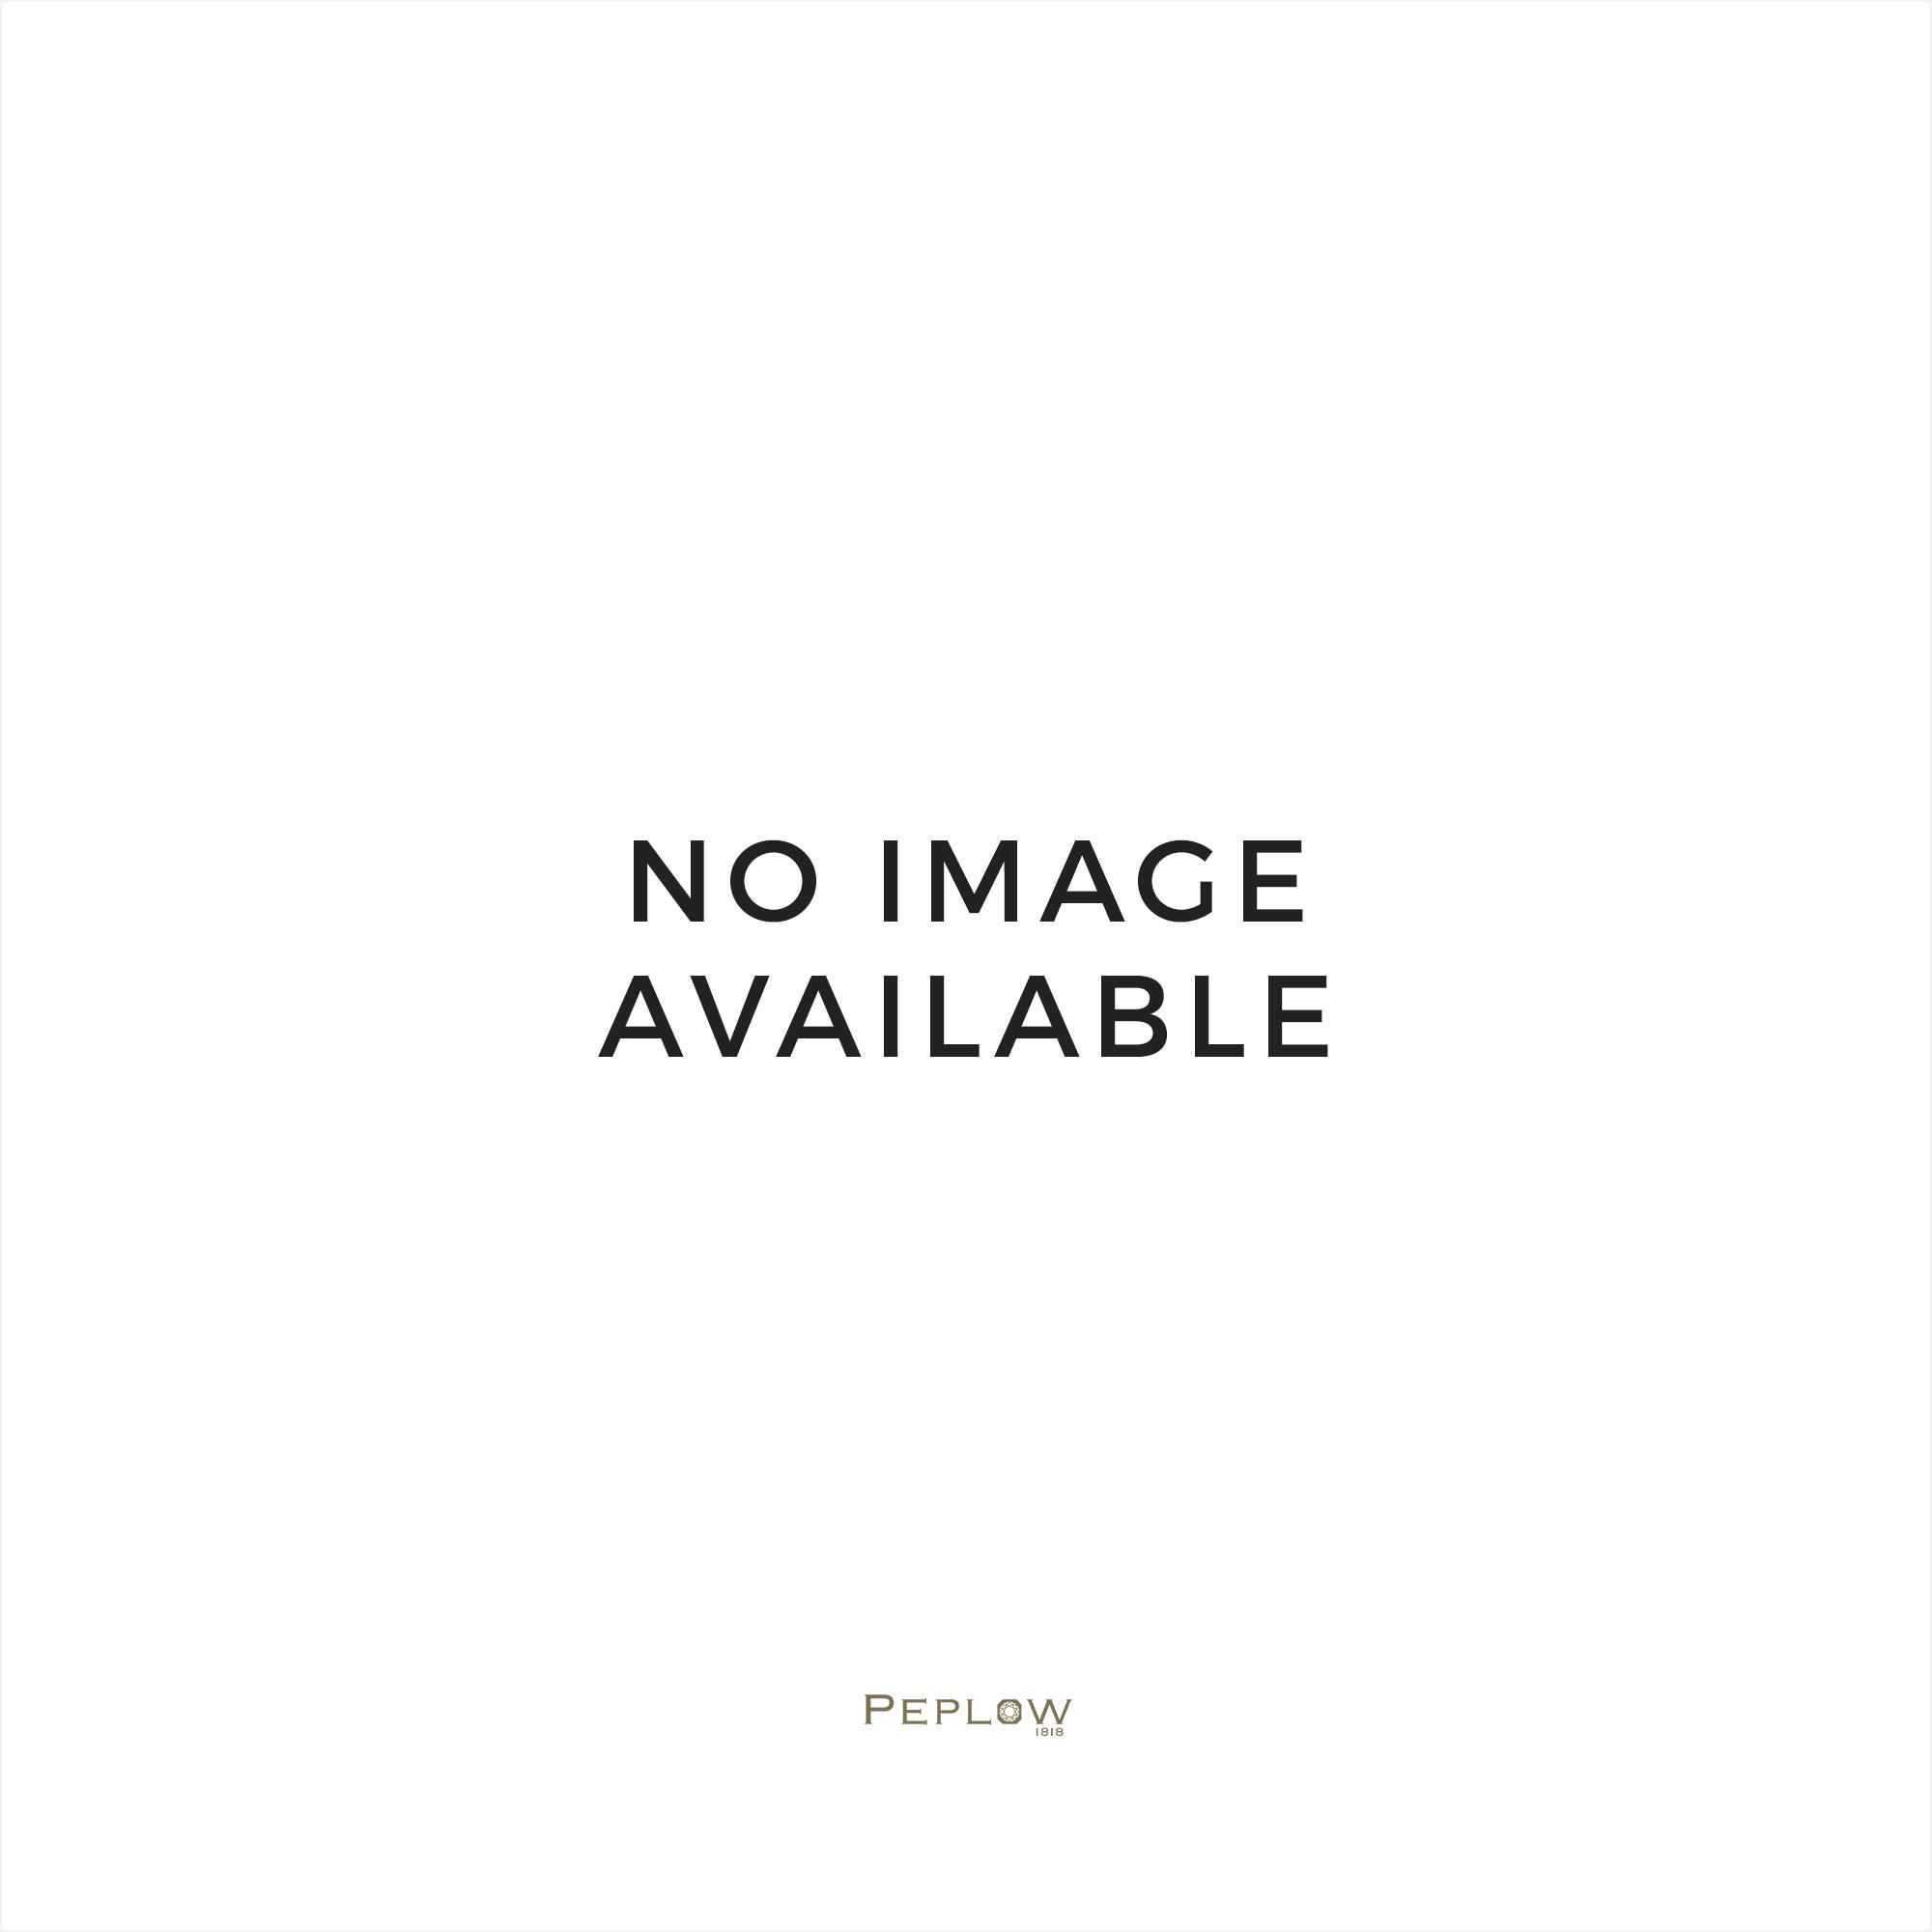 Citizen Watches Citizen Ladies Eco-Drive Sapphire Collection Watch